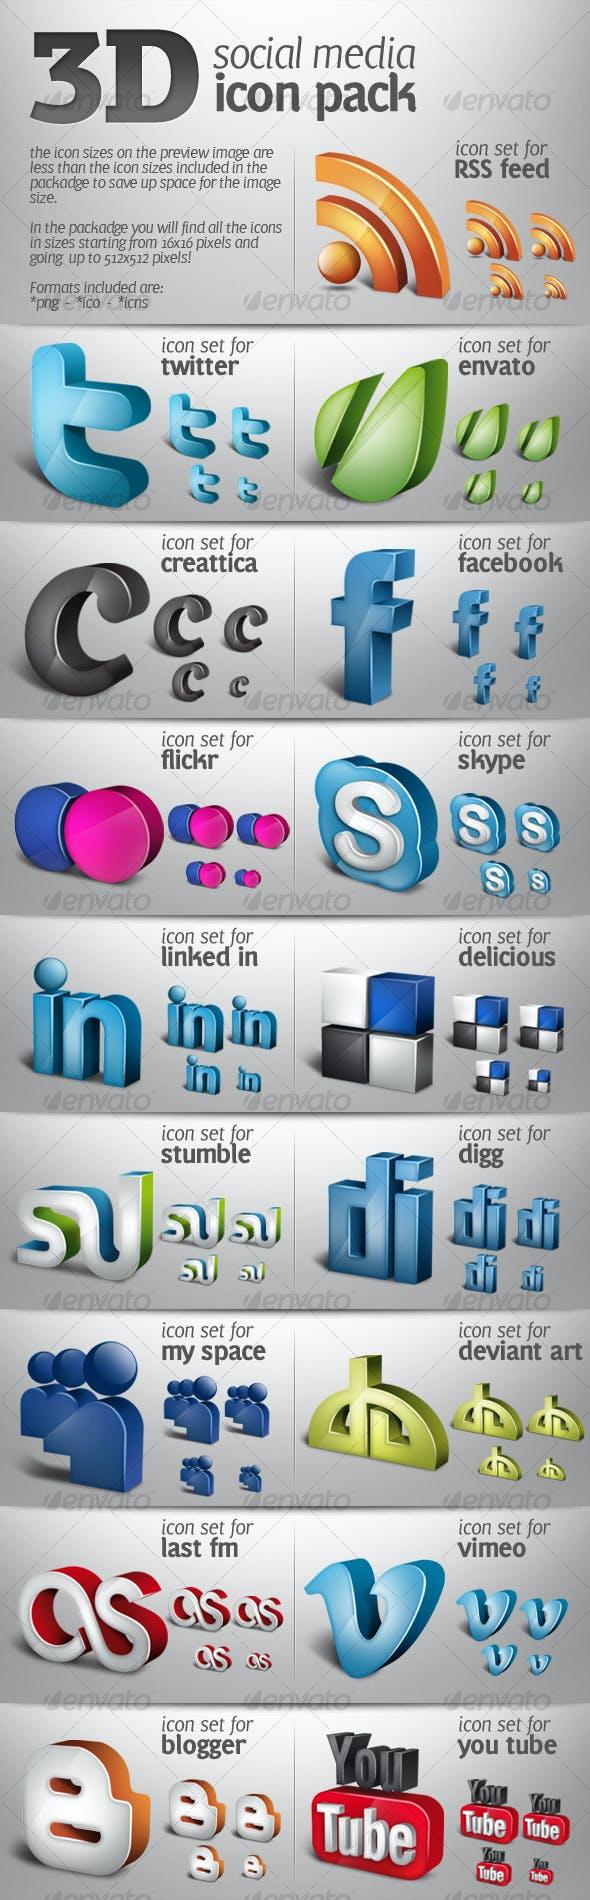 3D social media icons pack 01